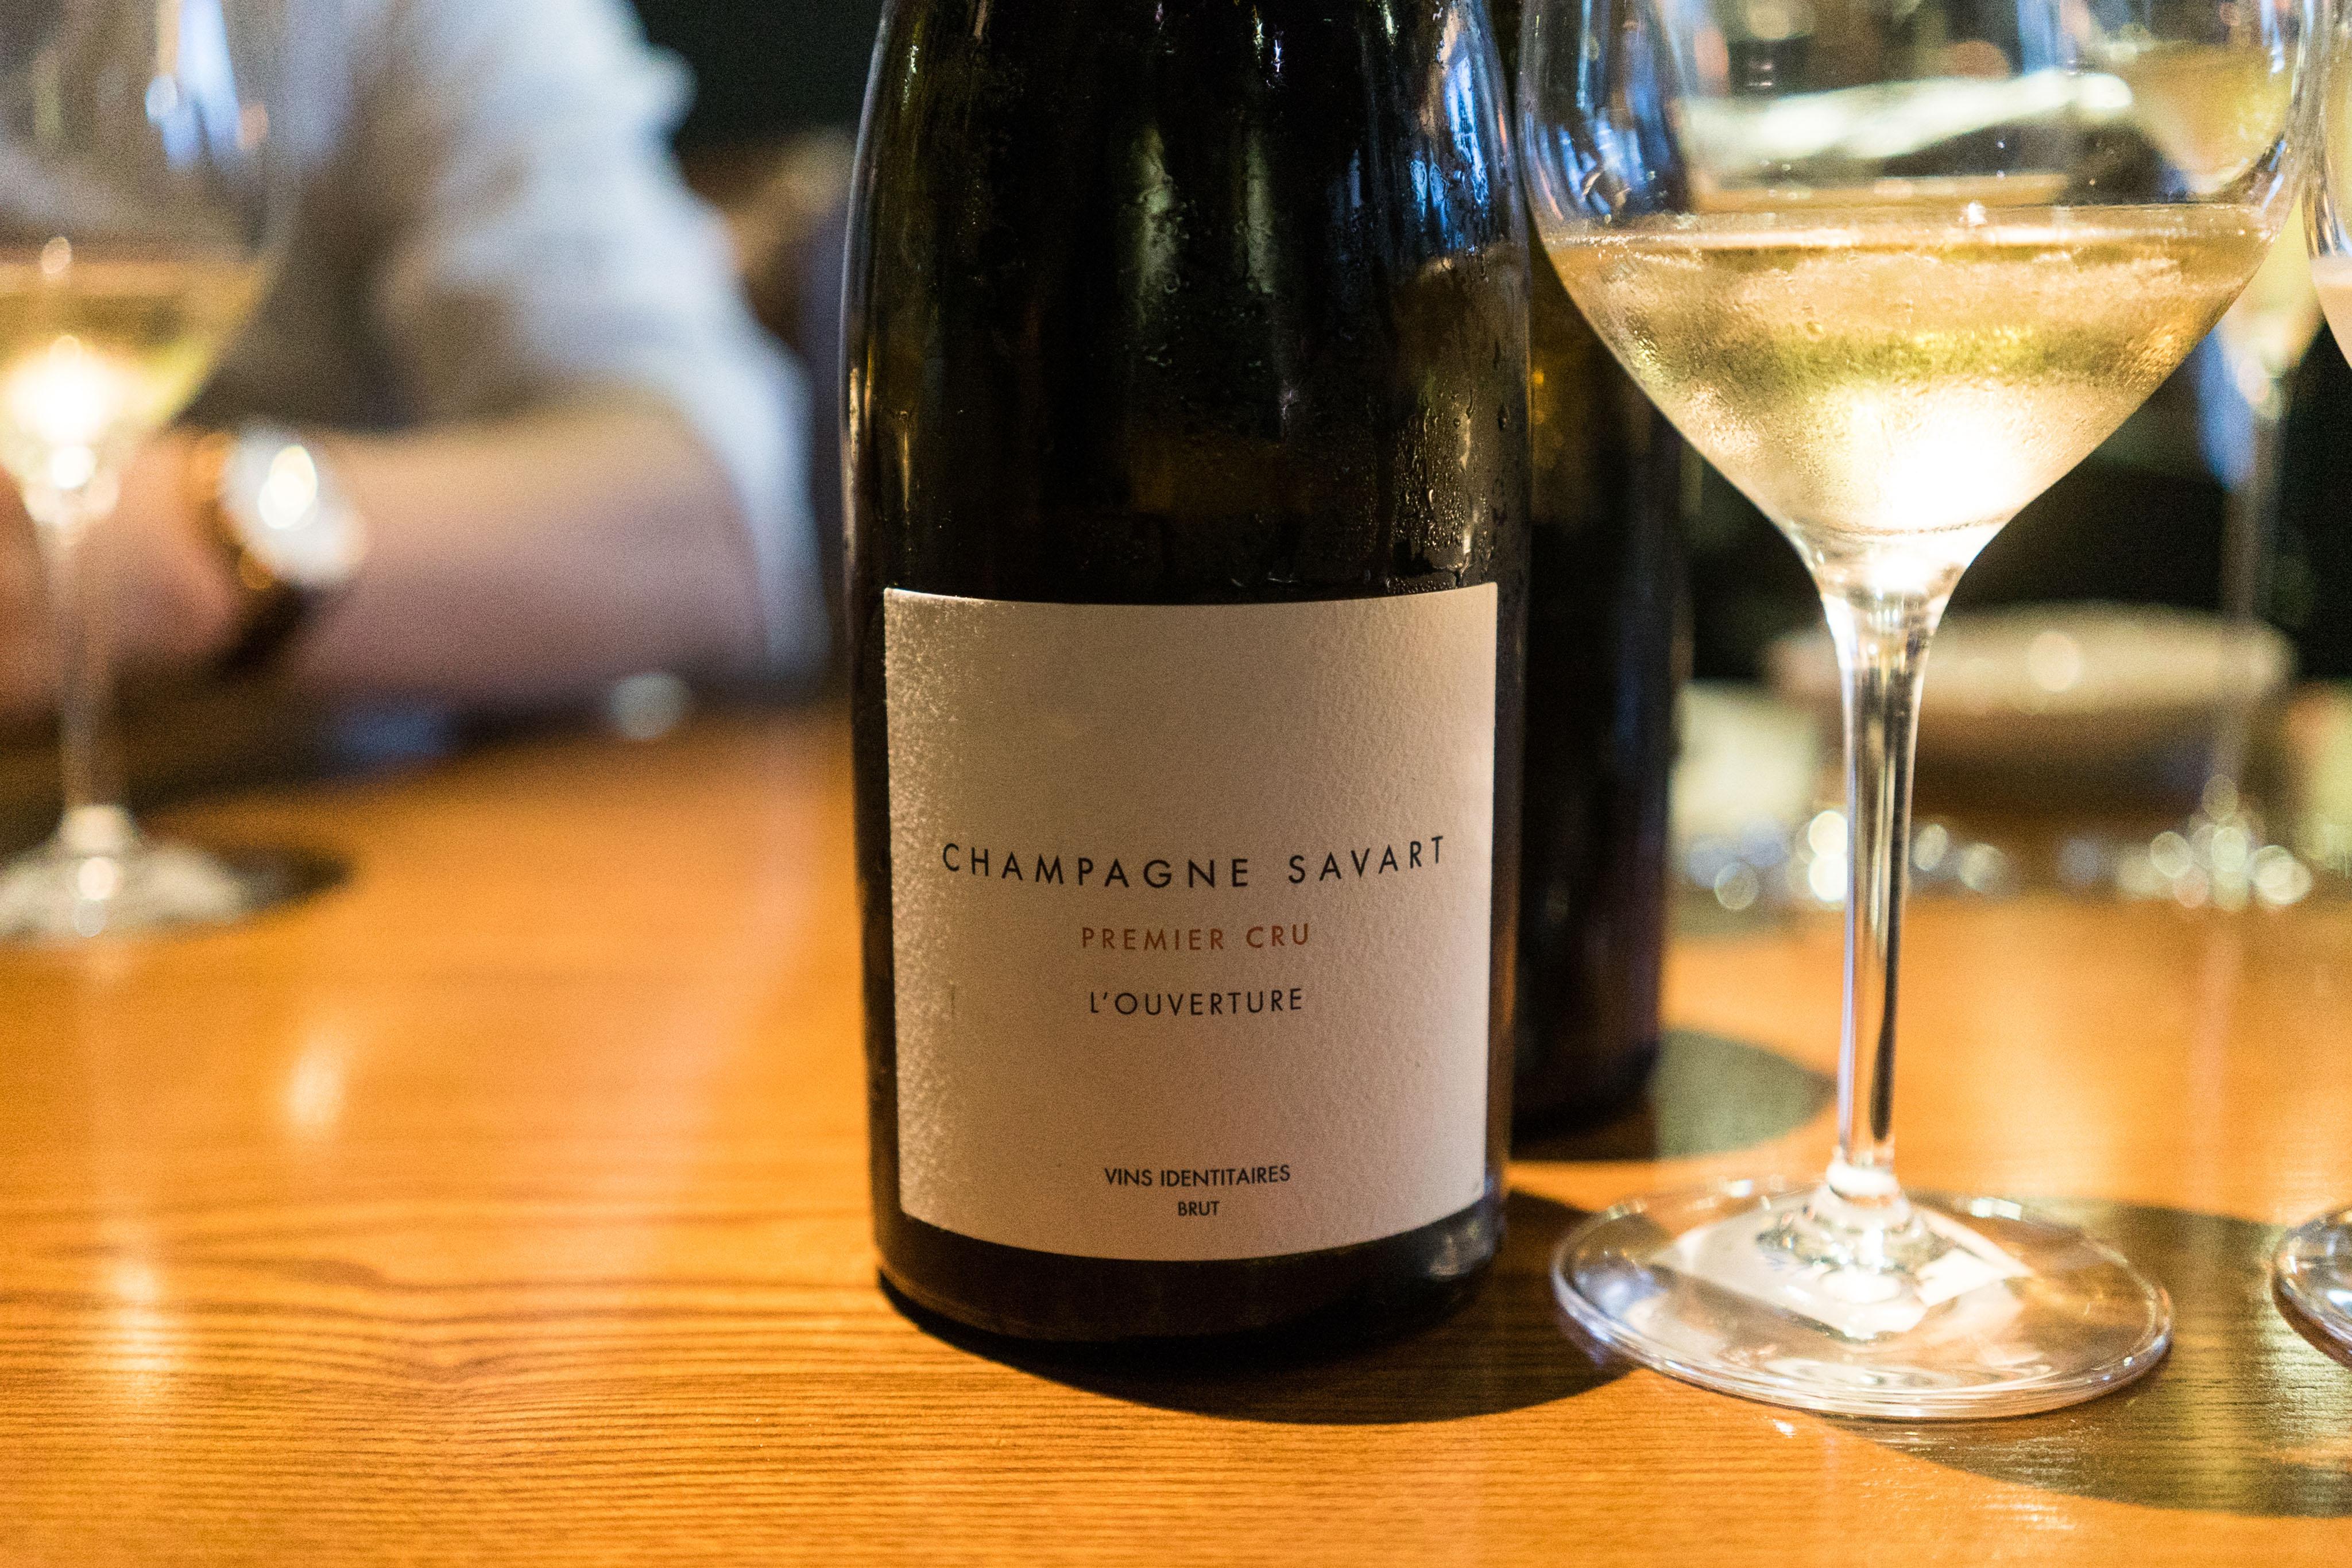 Champagne Savart L'ouverture